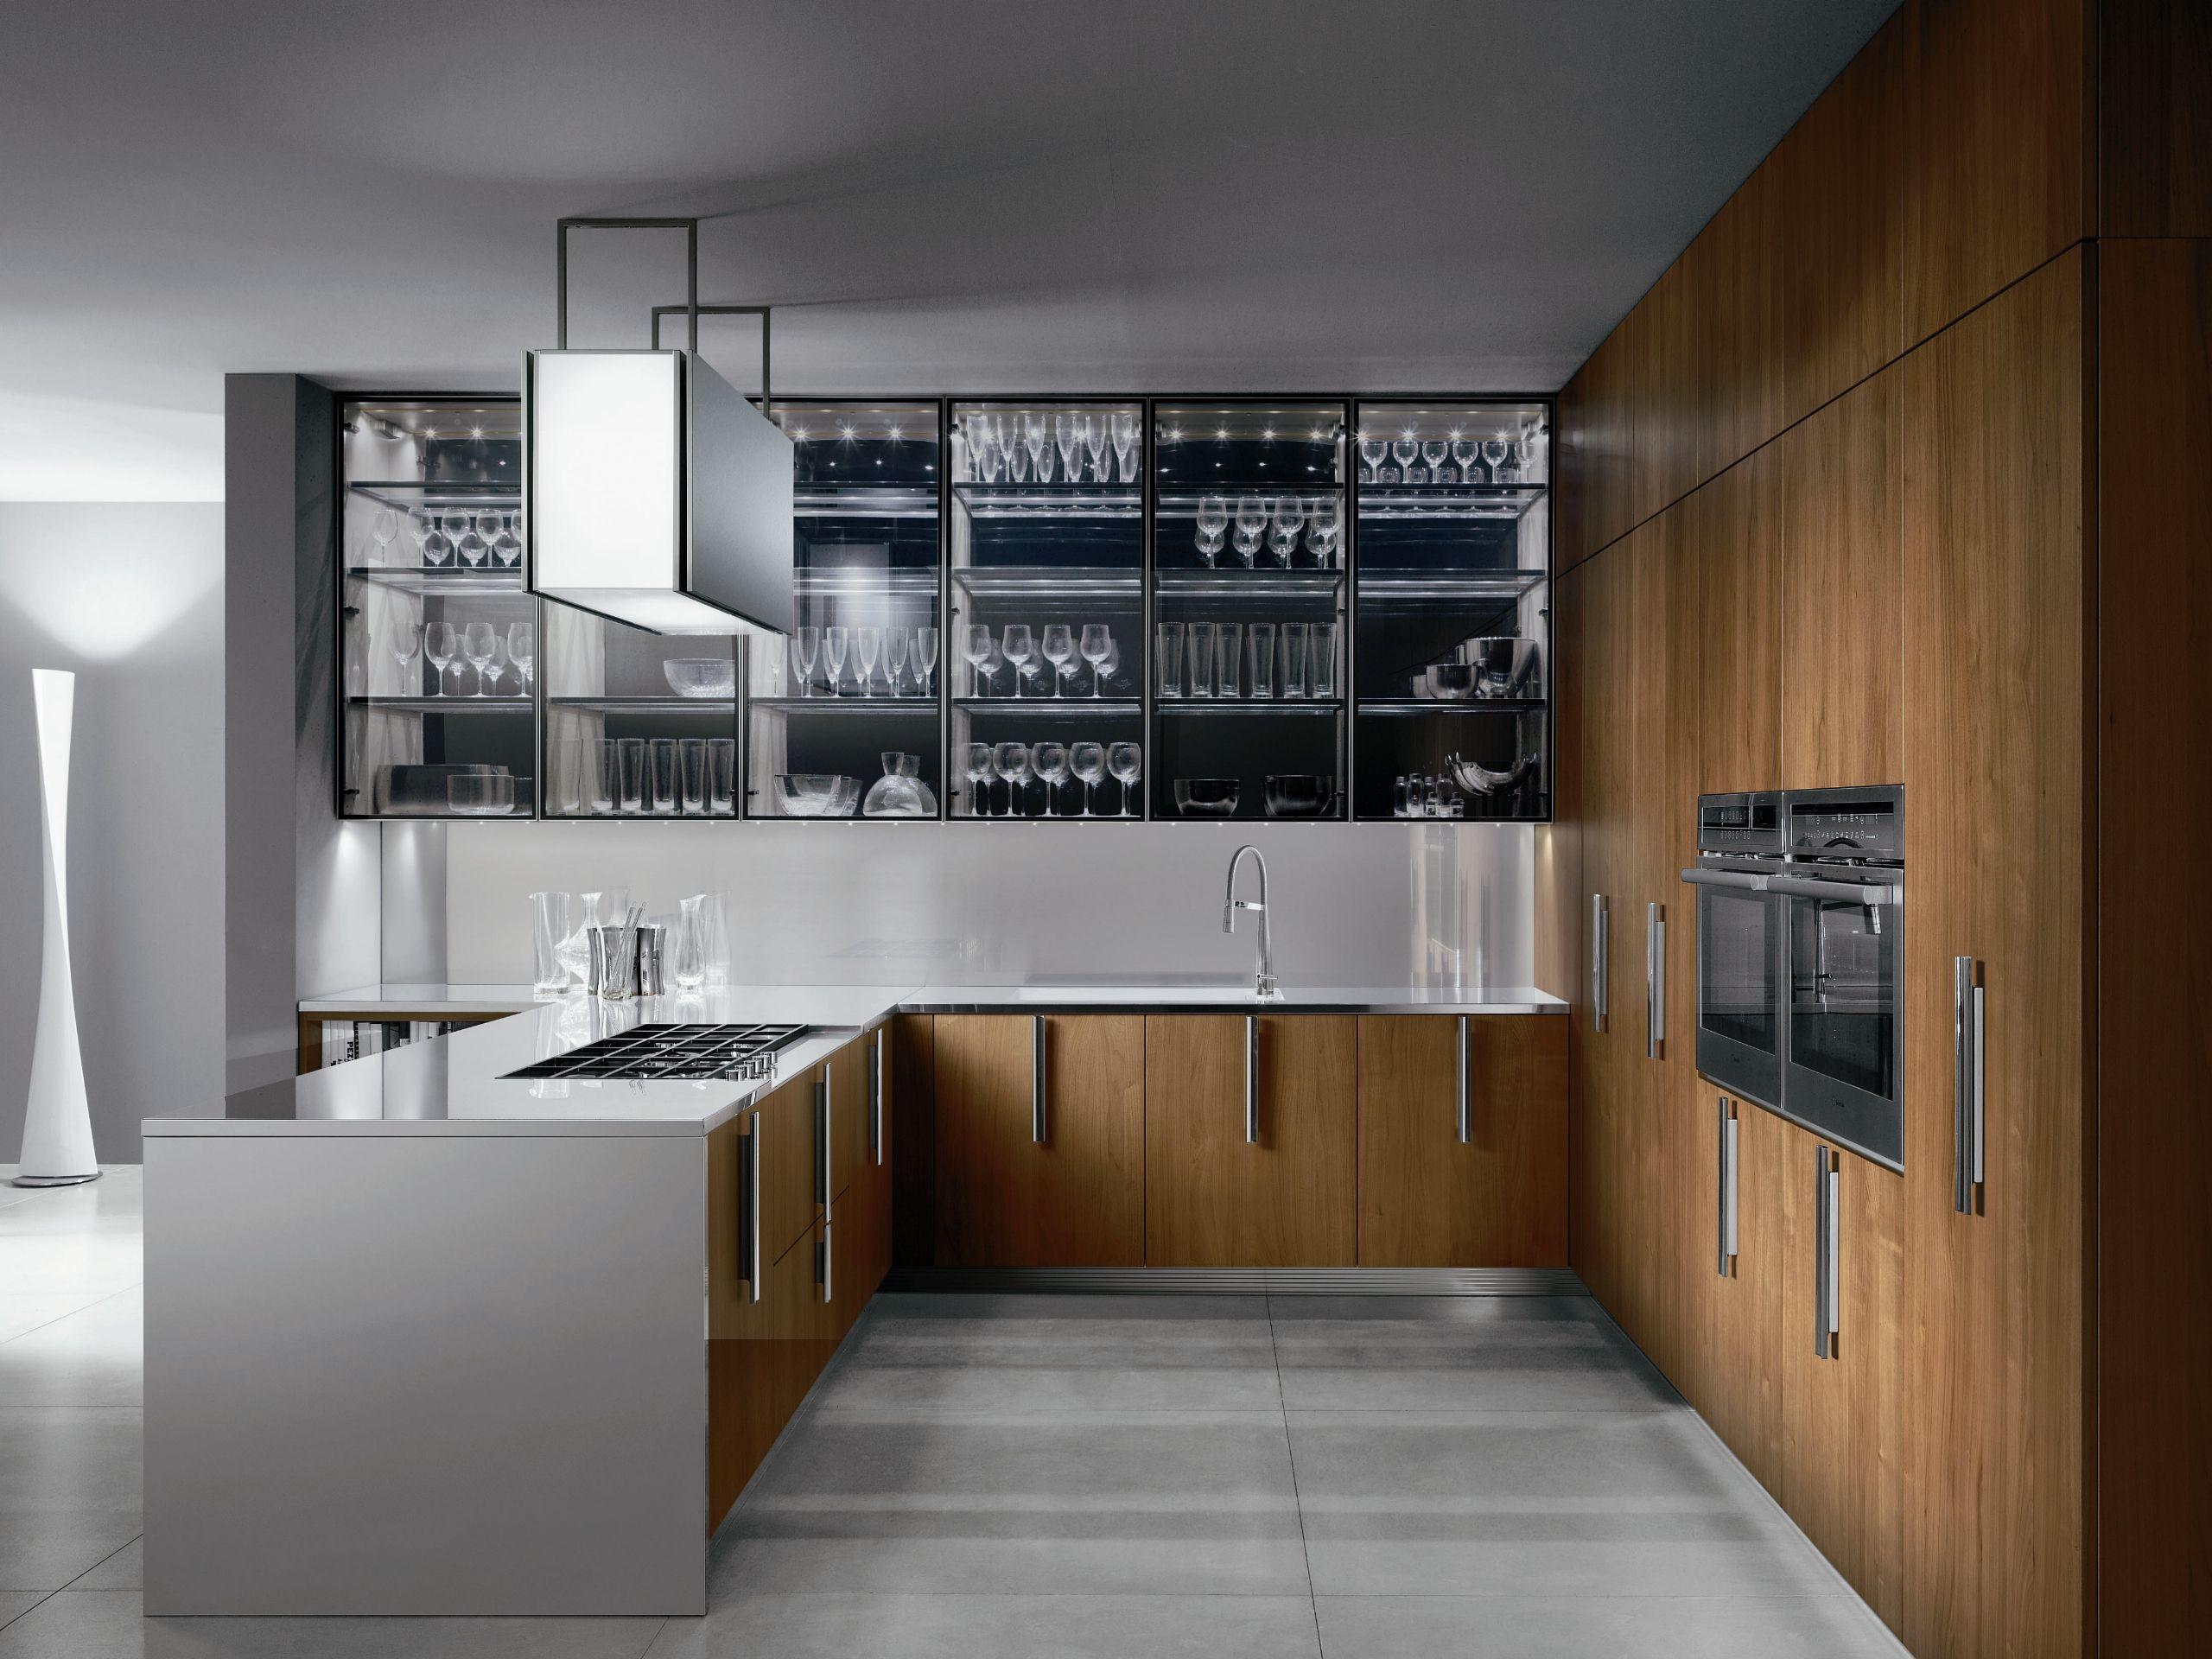 Famoso Best Cucine Legno E Acciaio Ideas - Home Design Ideas 2017  YR58